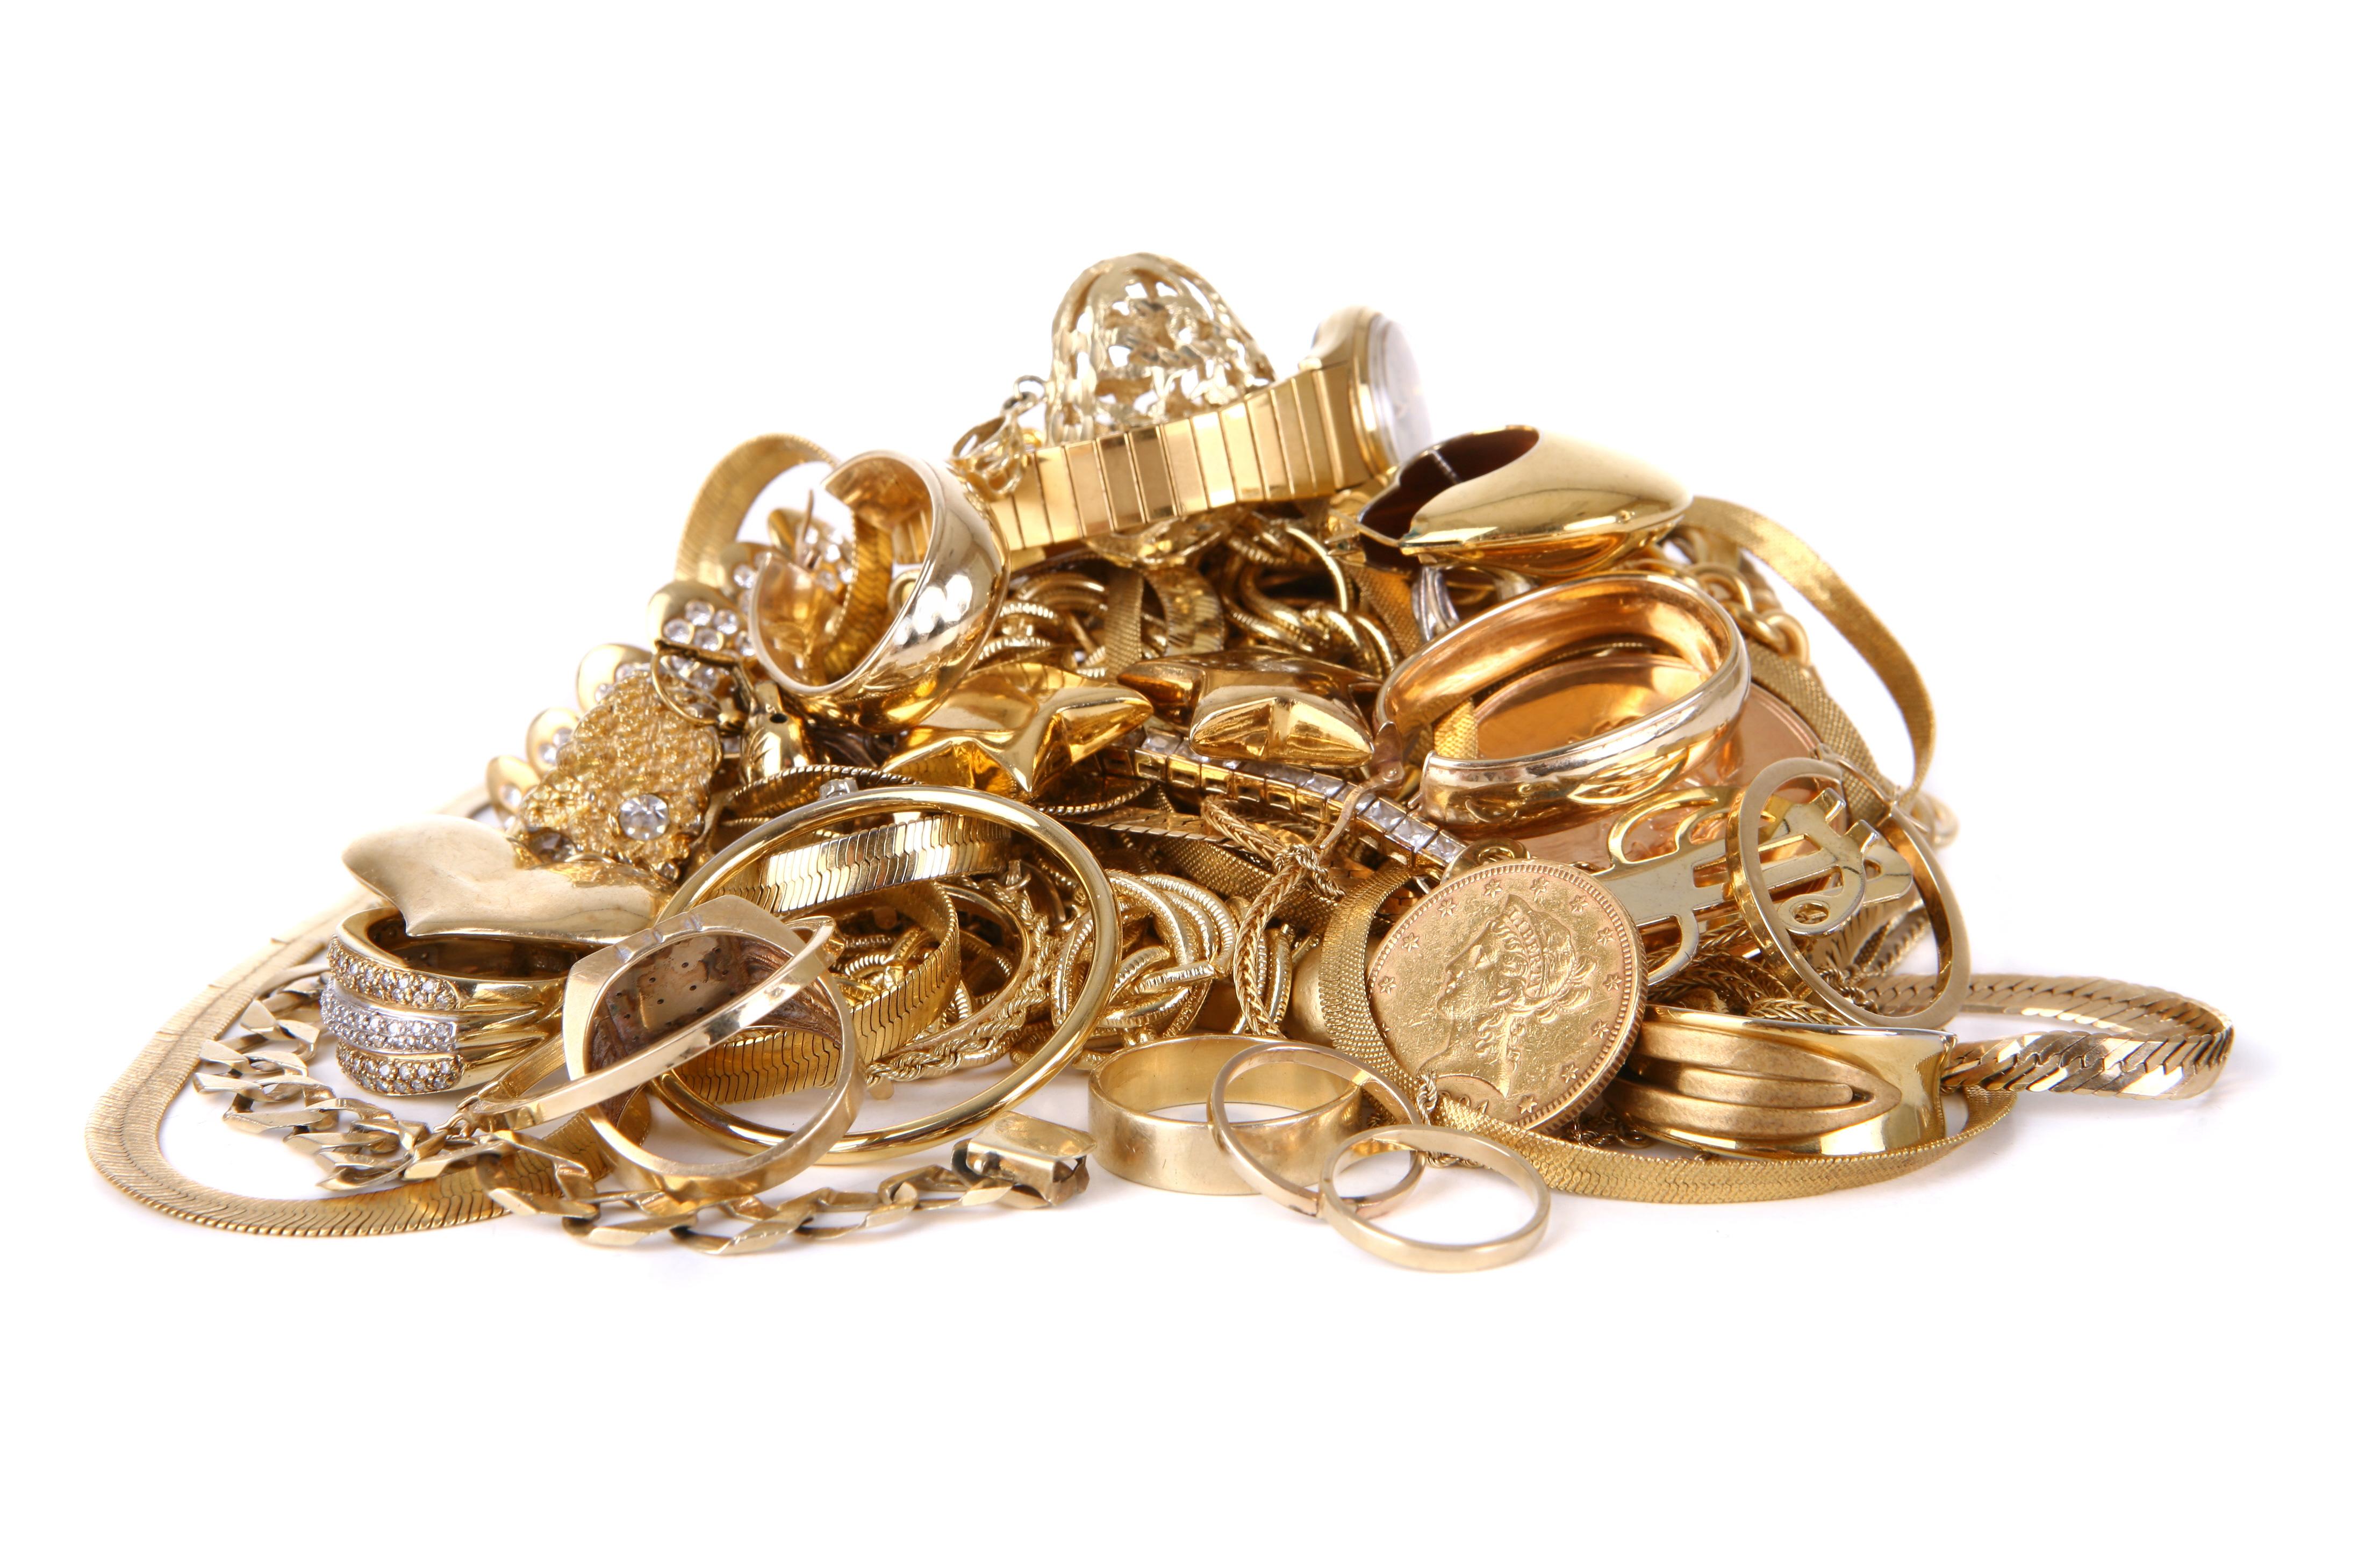 e124dc77d6192 Items That Contain Scrap Gold | Pocketsense